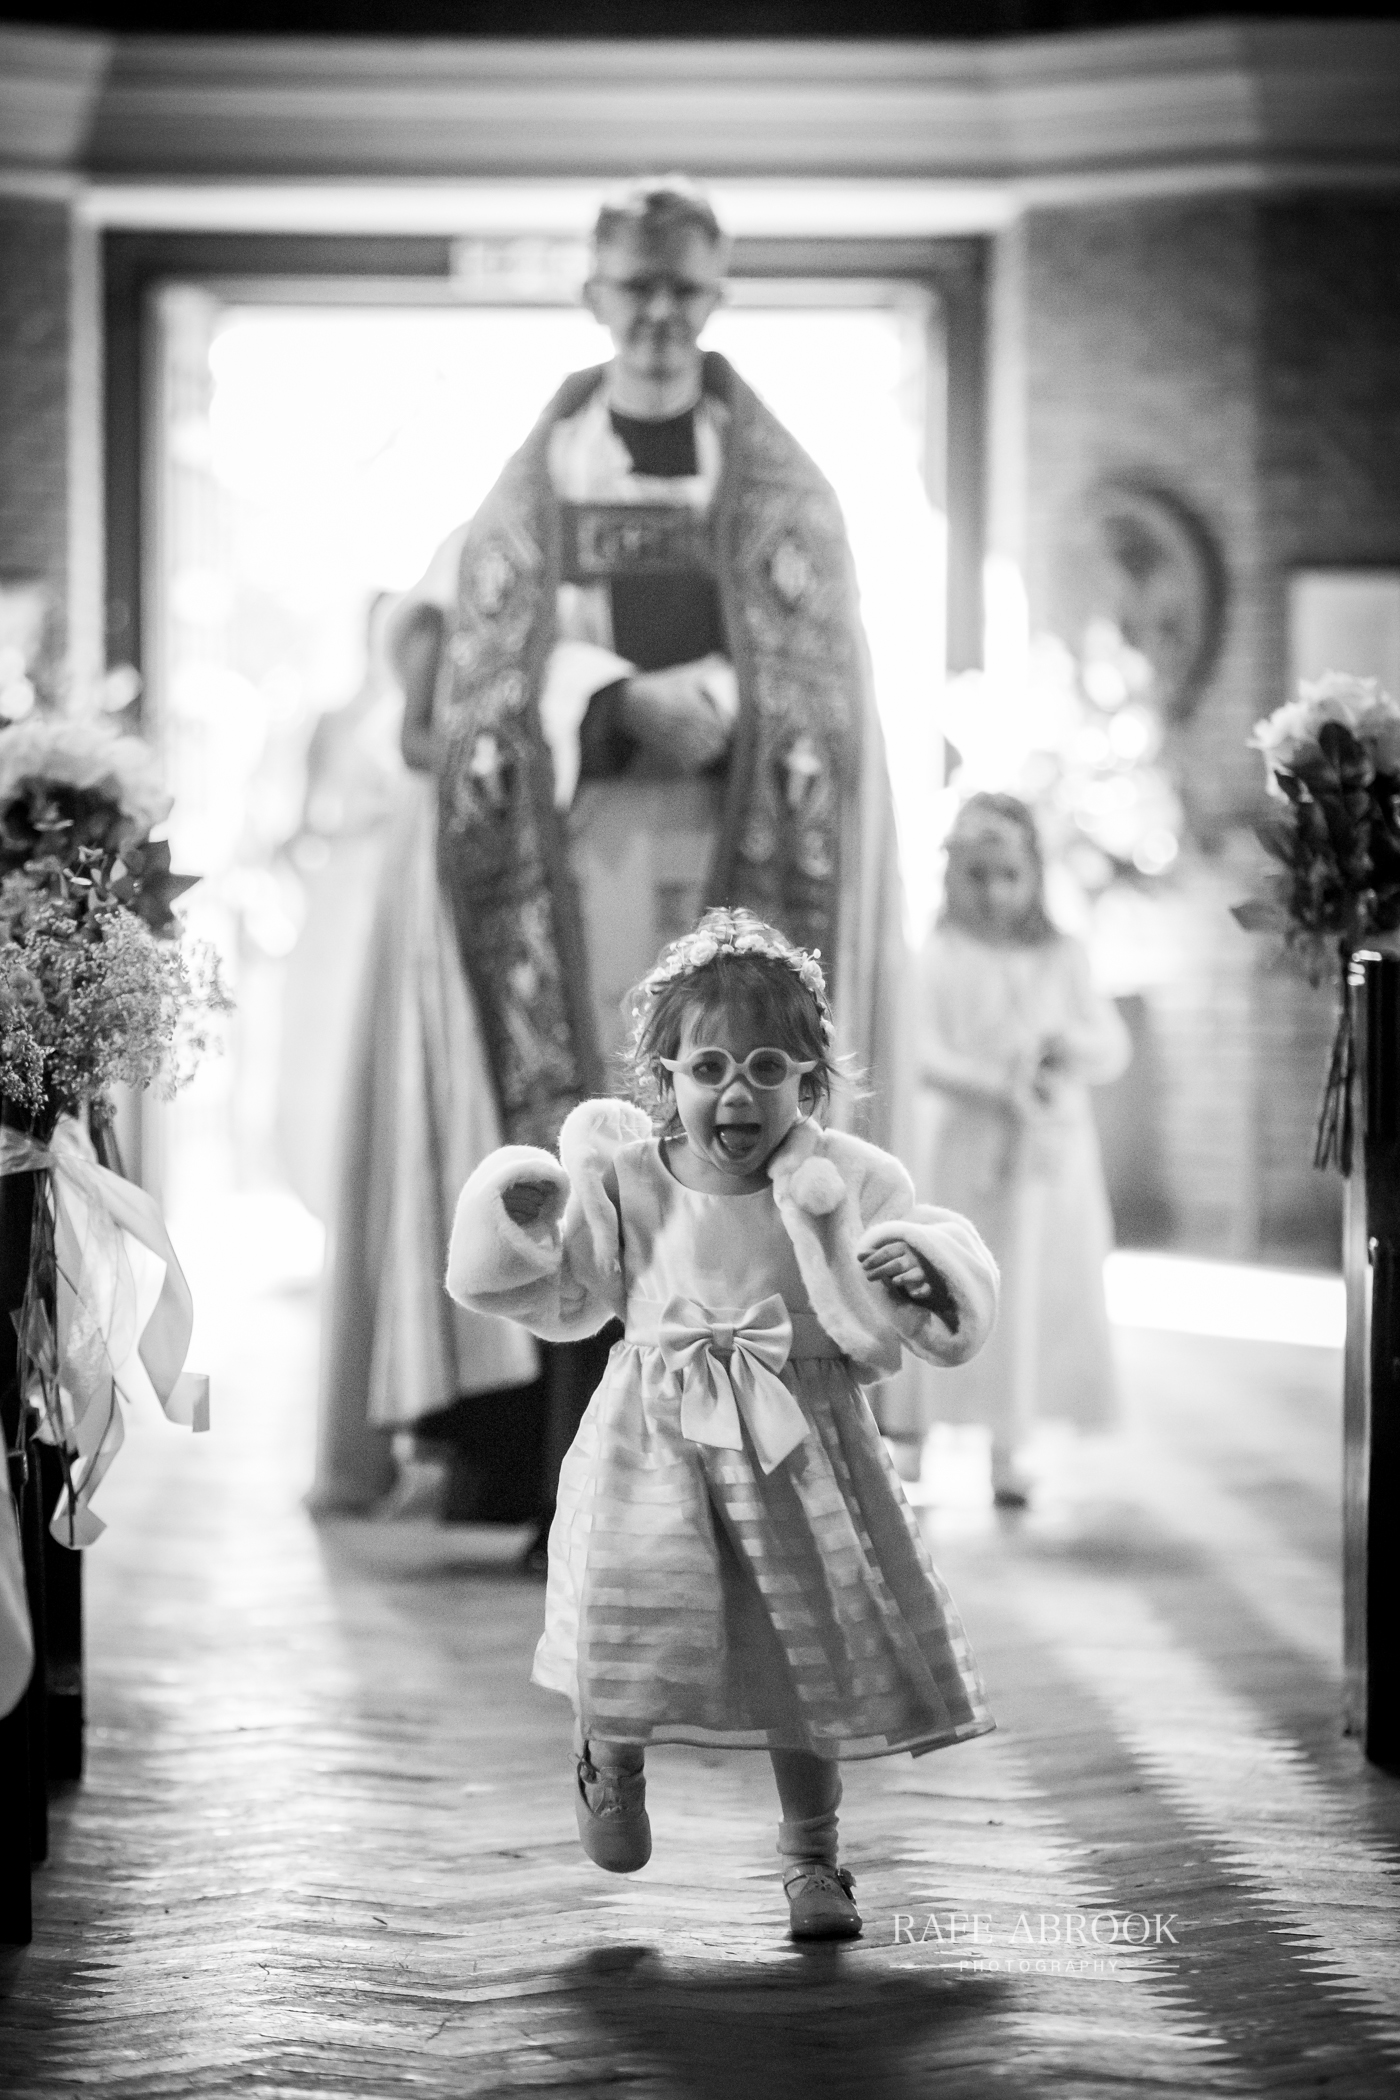 roma & pete wedding hampstead shenley hertfordshire -133.jpg